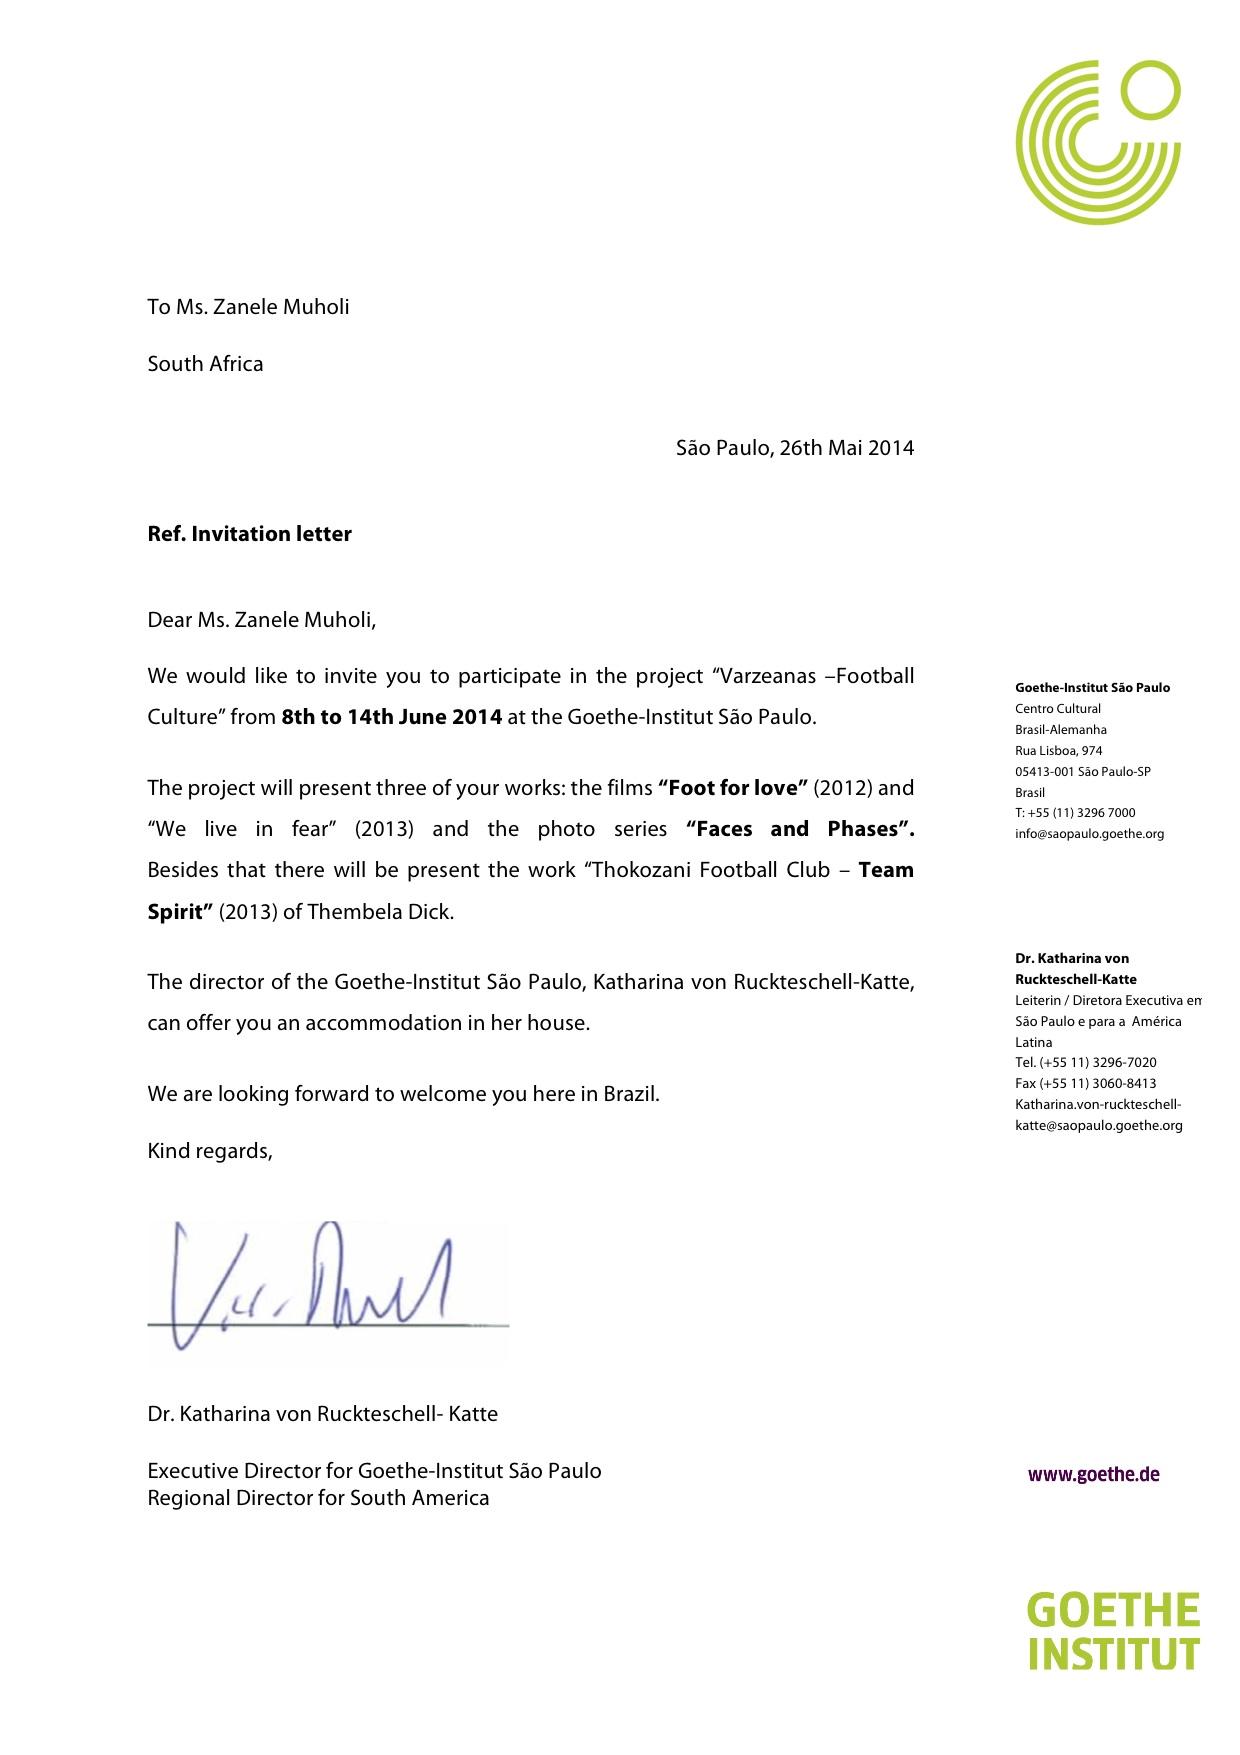 Cover letter invitation event – Business Event Invitation Letter